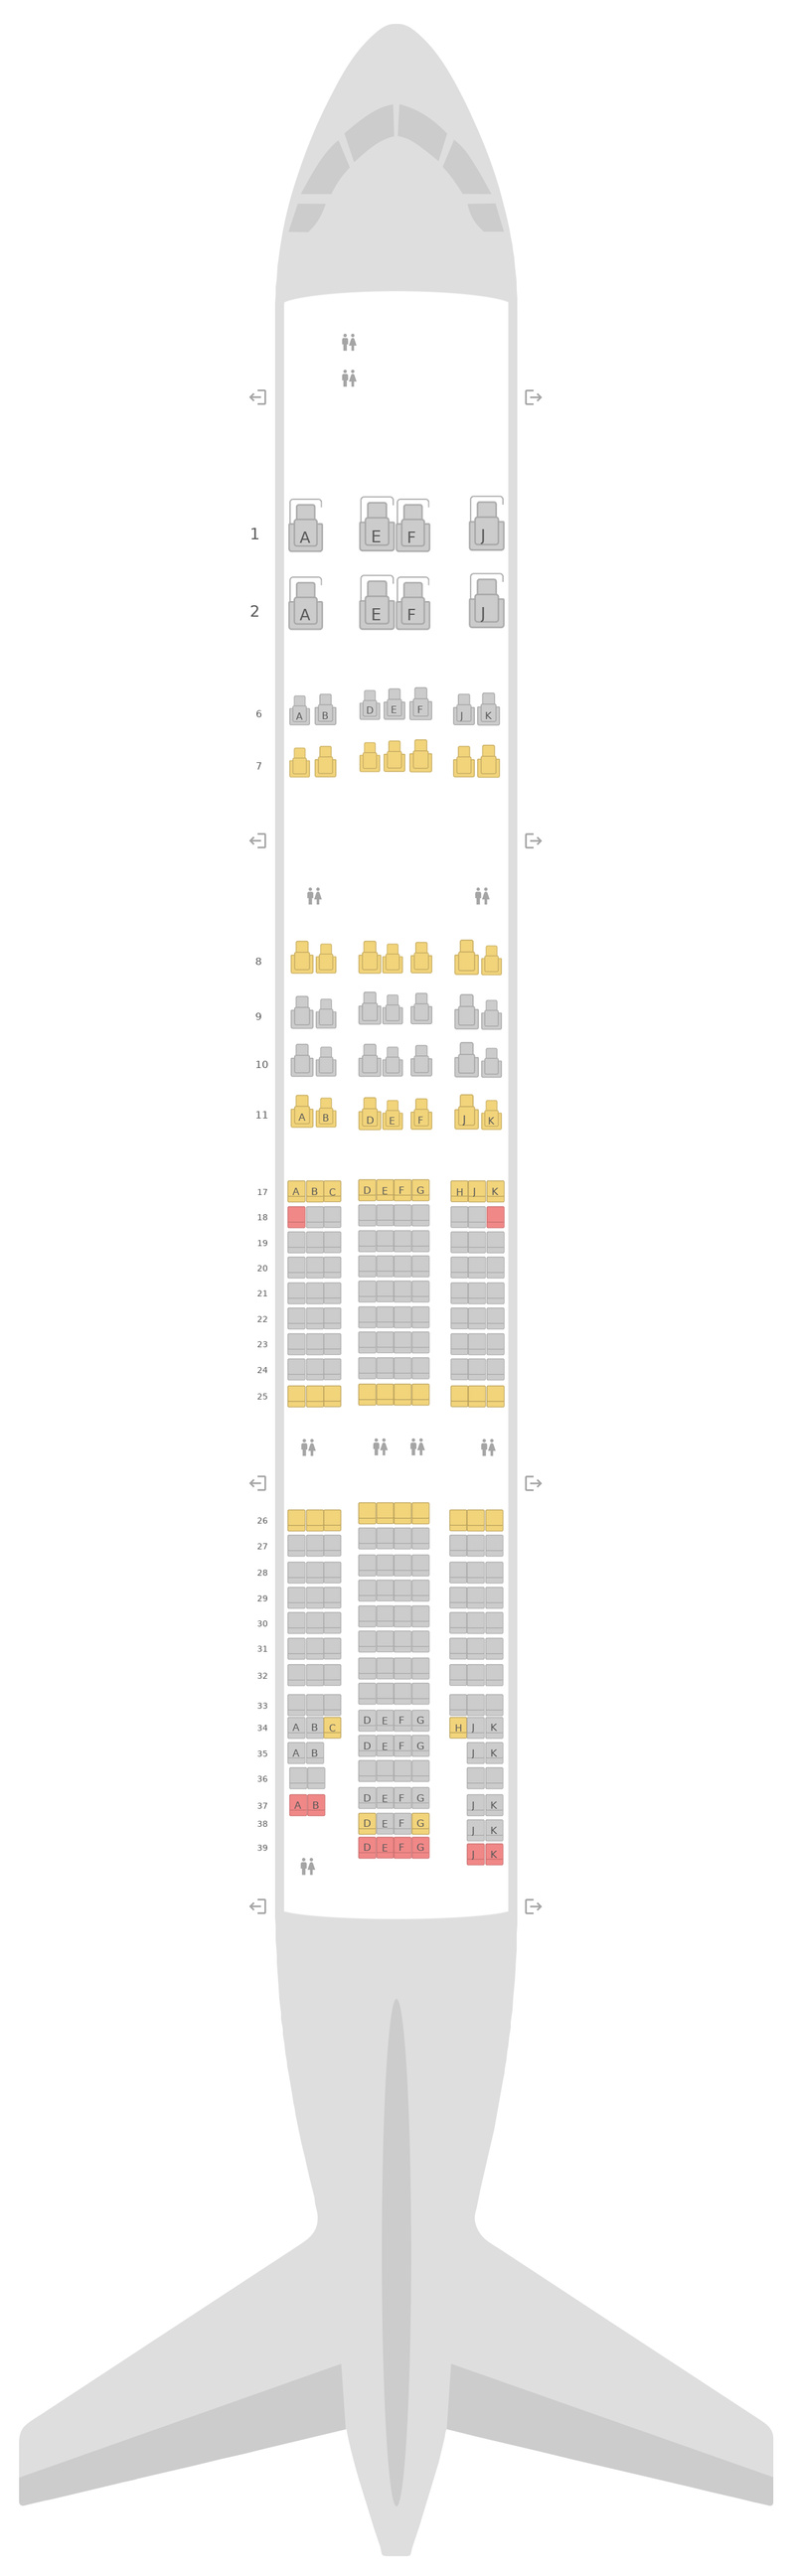 Mapa de asientos Boeing 777-200LR 3 Class Emirates